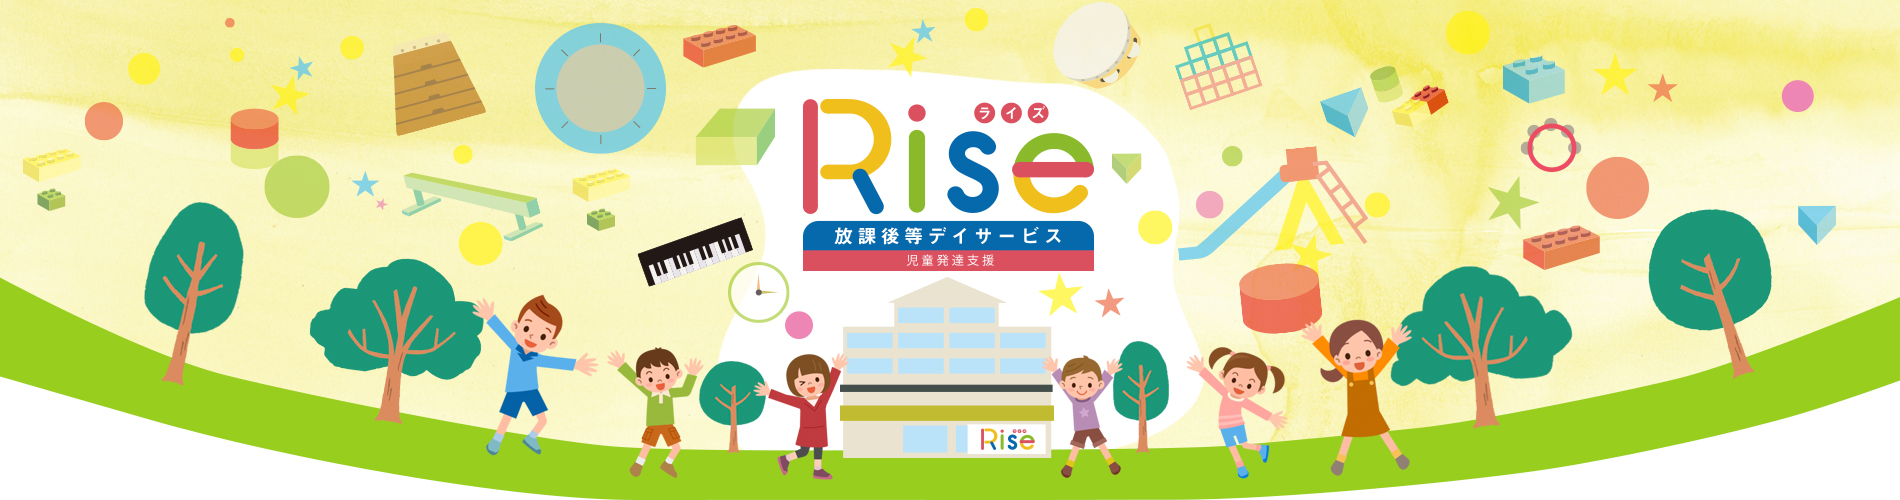 Rise ライズ 放課後等デイサービス 児童発達支援